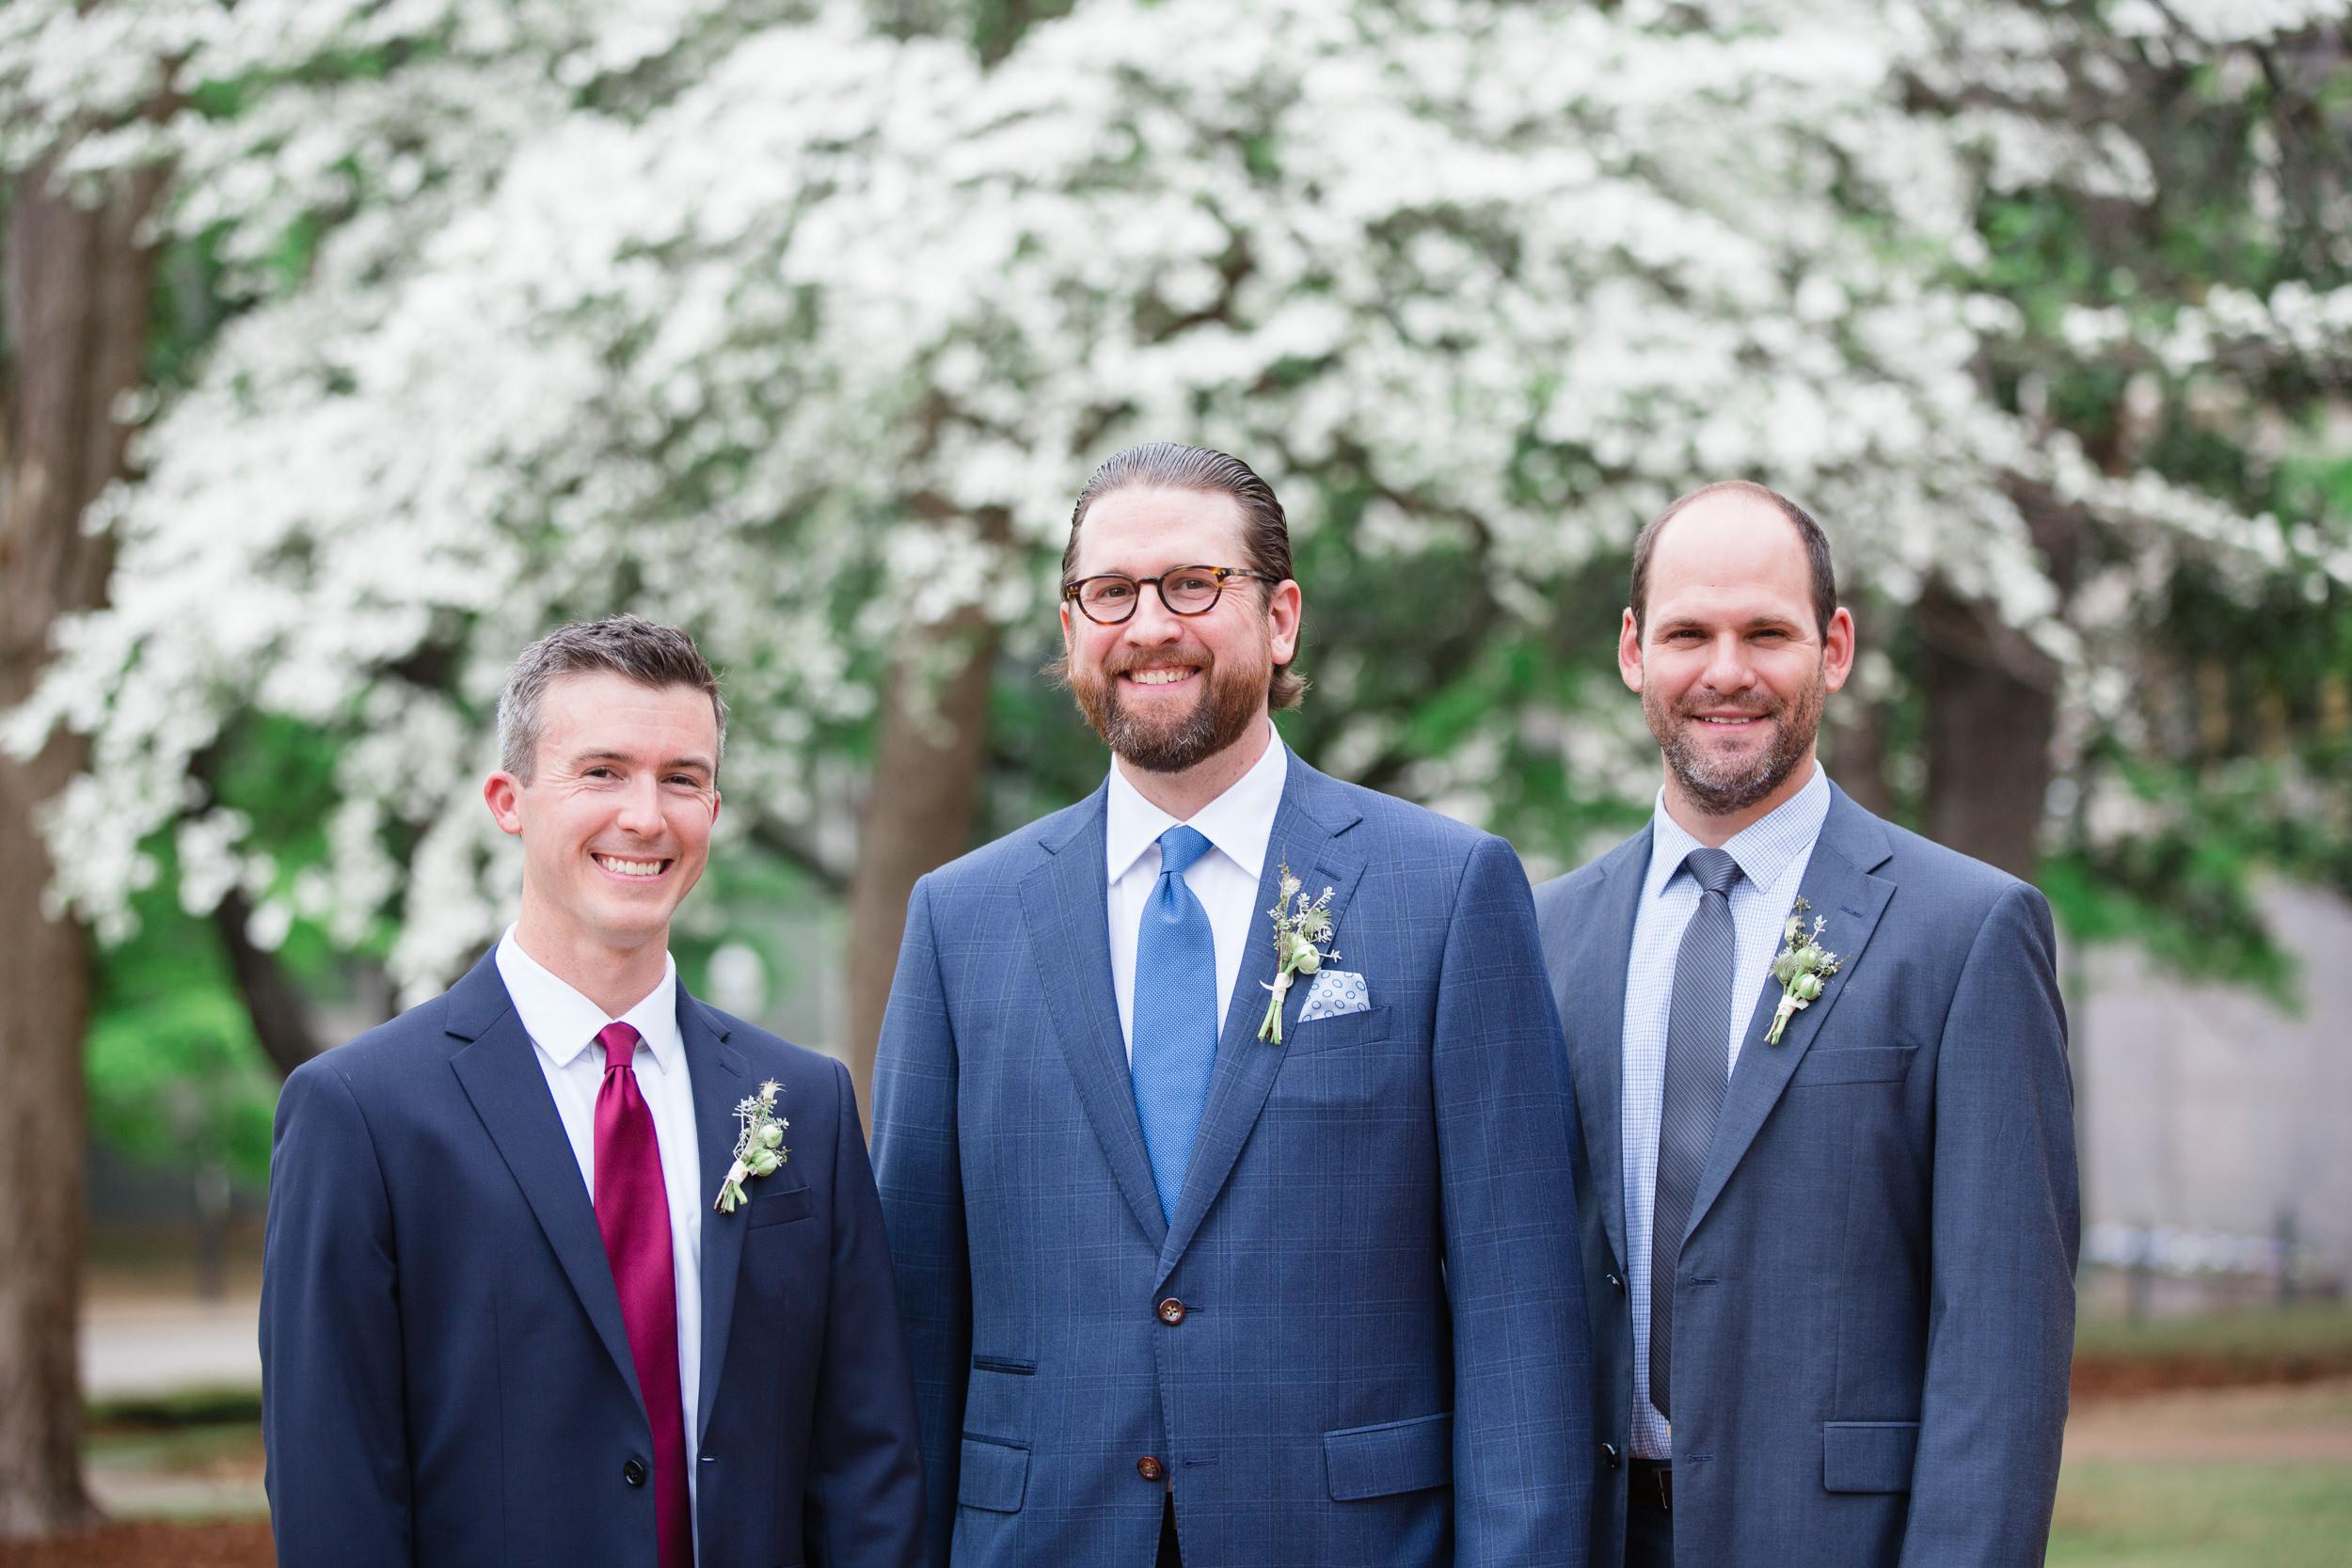 LK_Birmingham_AL_Wedding_2019-00024.jpg